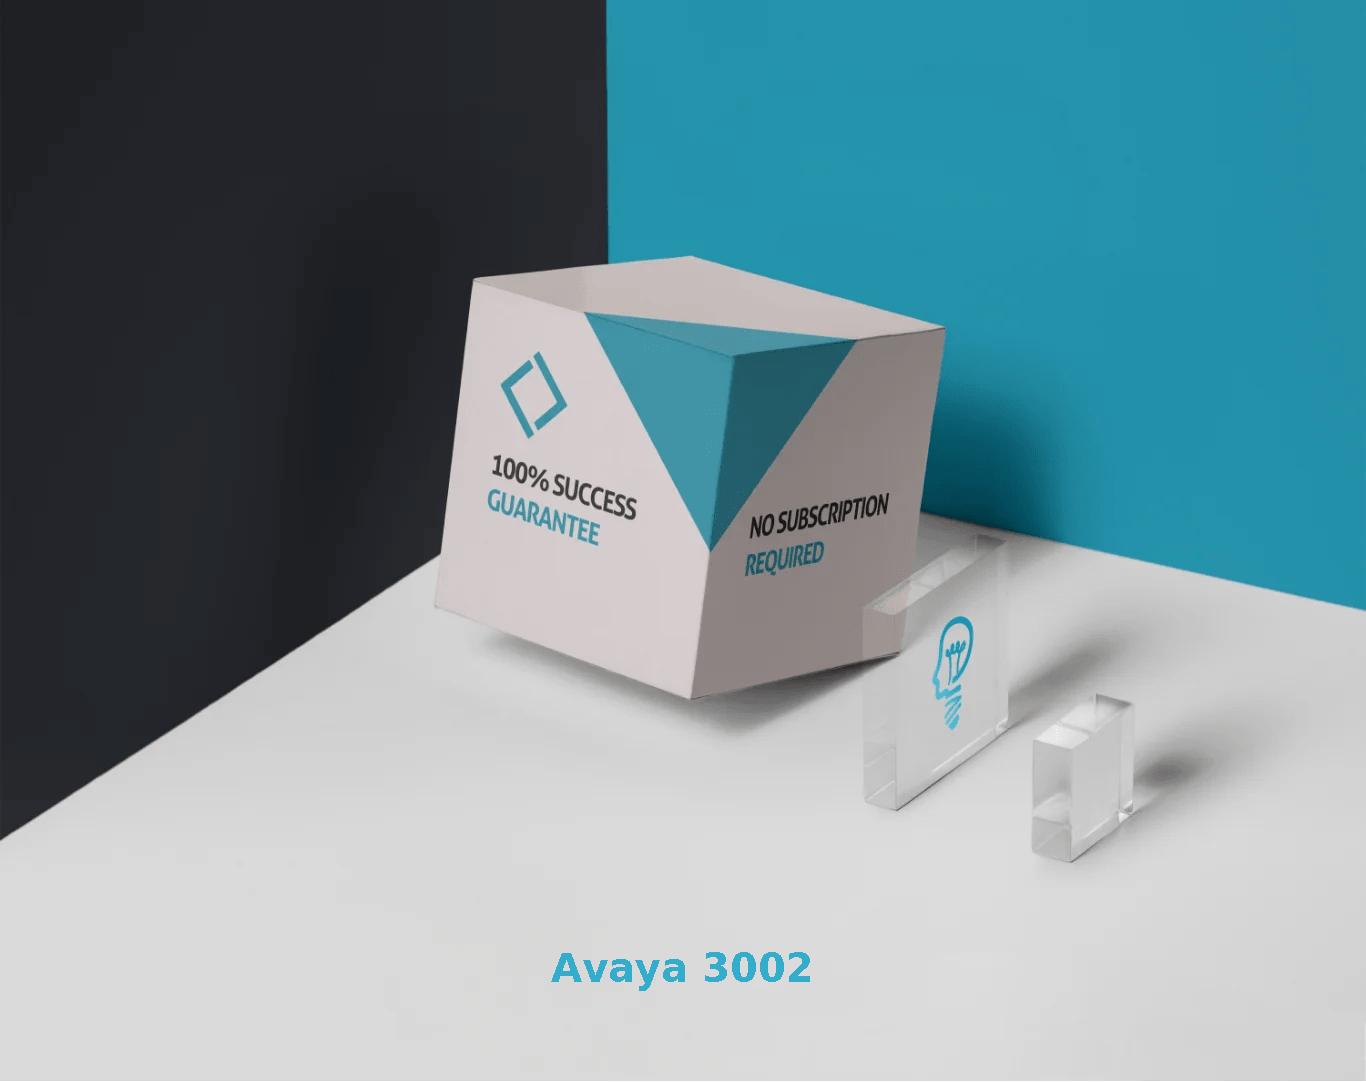 Avaya 3002 Exams